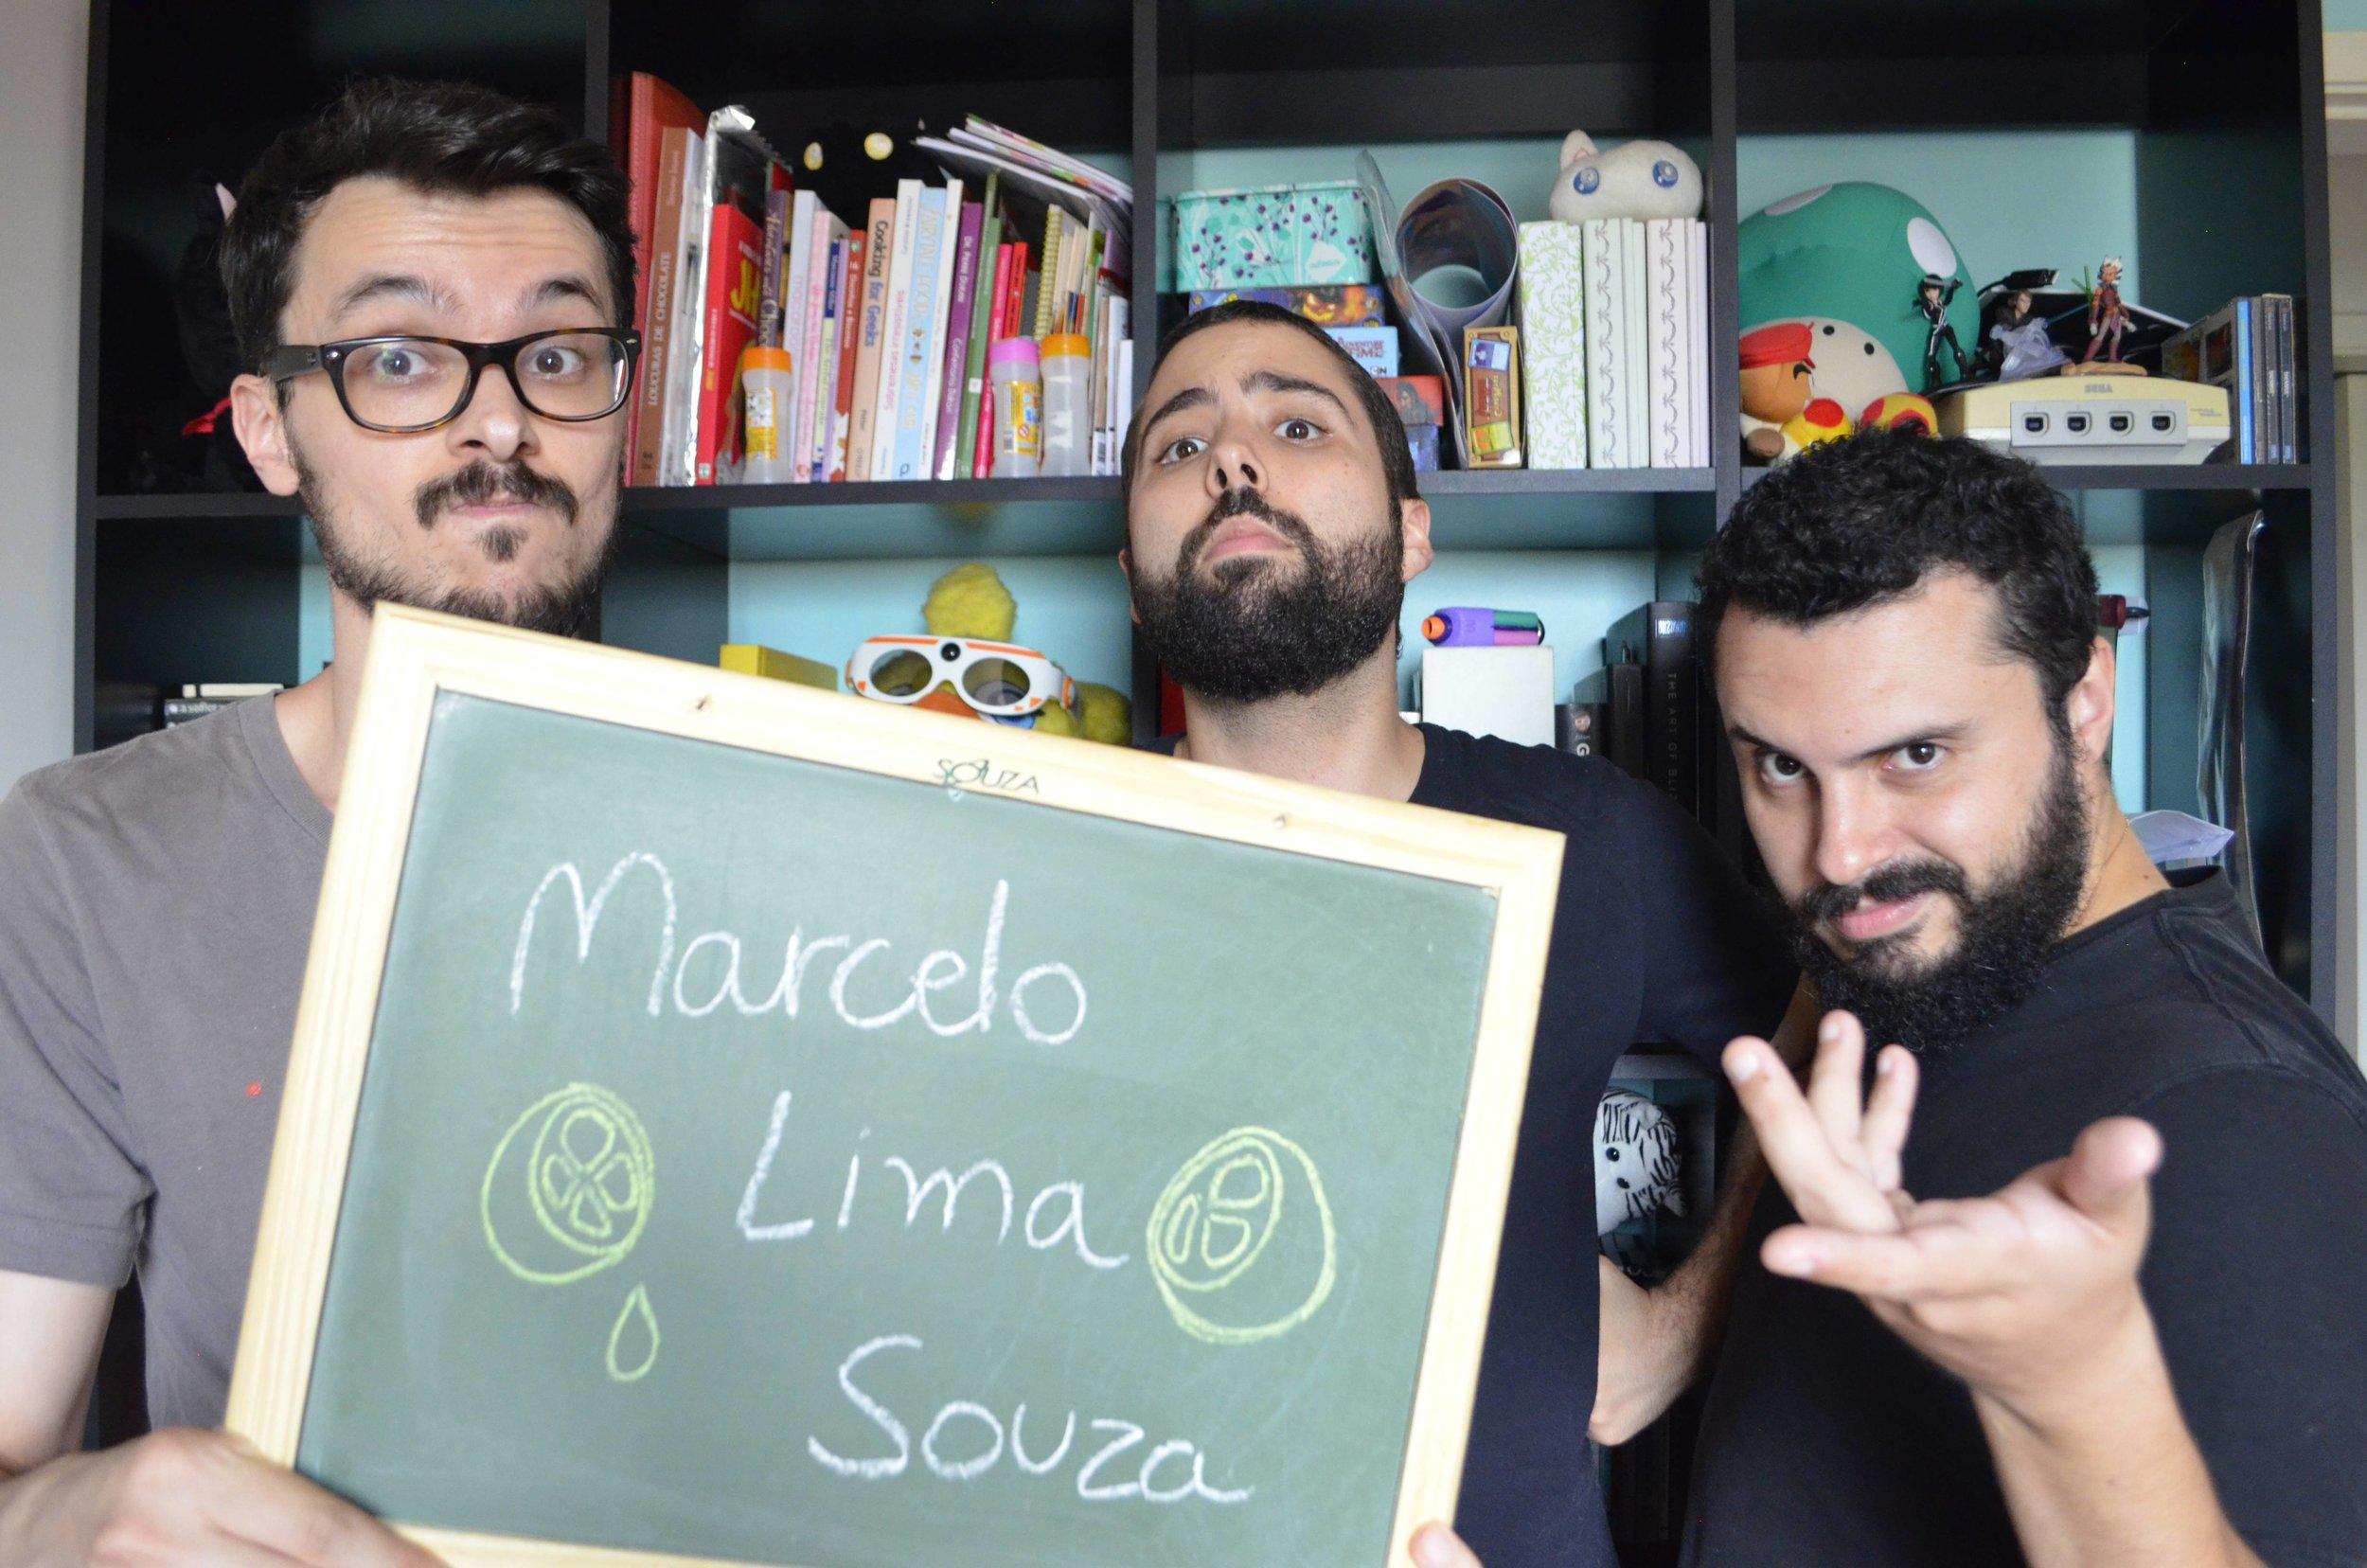 Marcelo-Lima-Souza.jpg